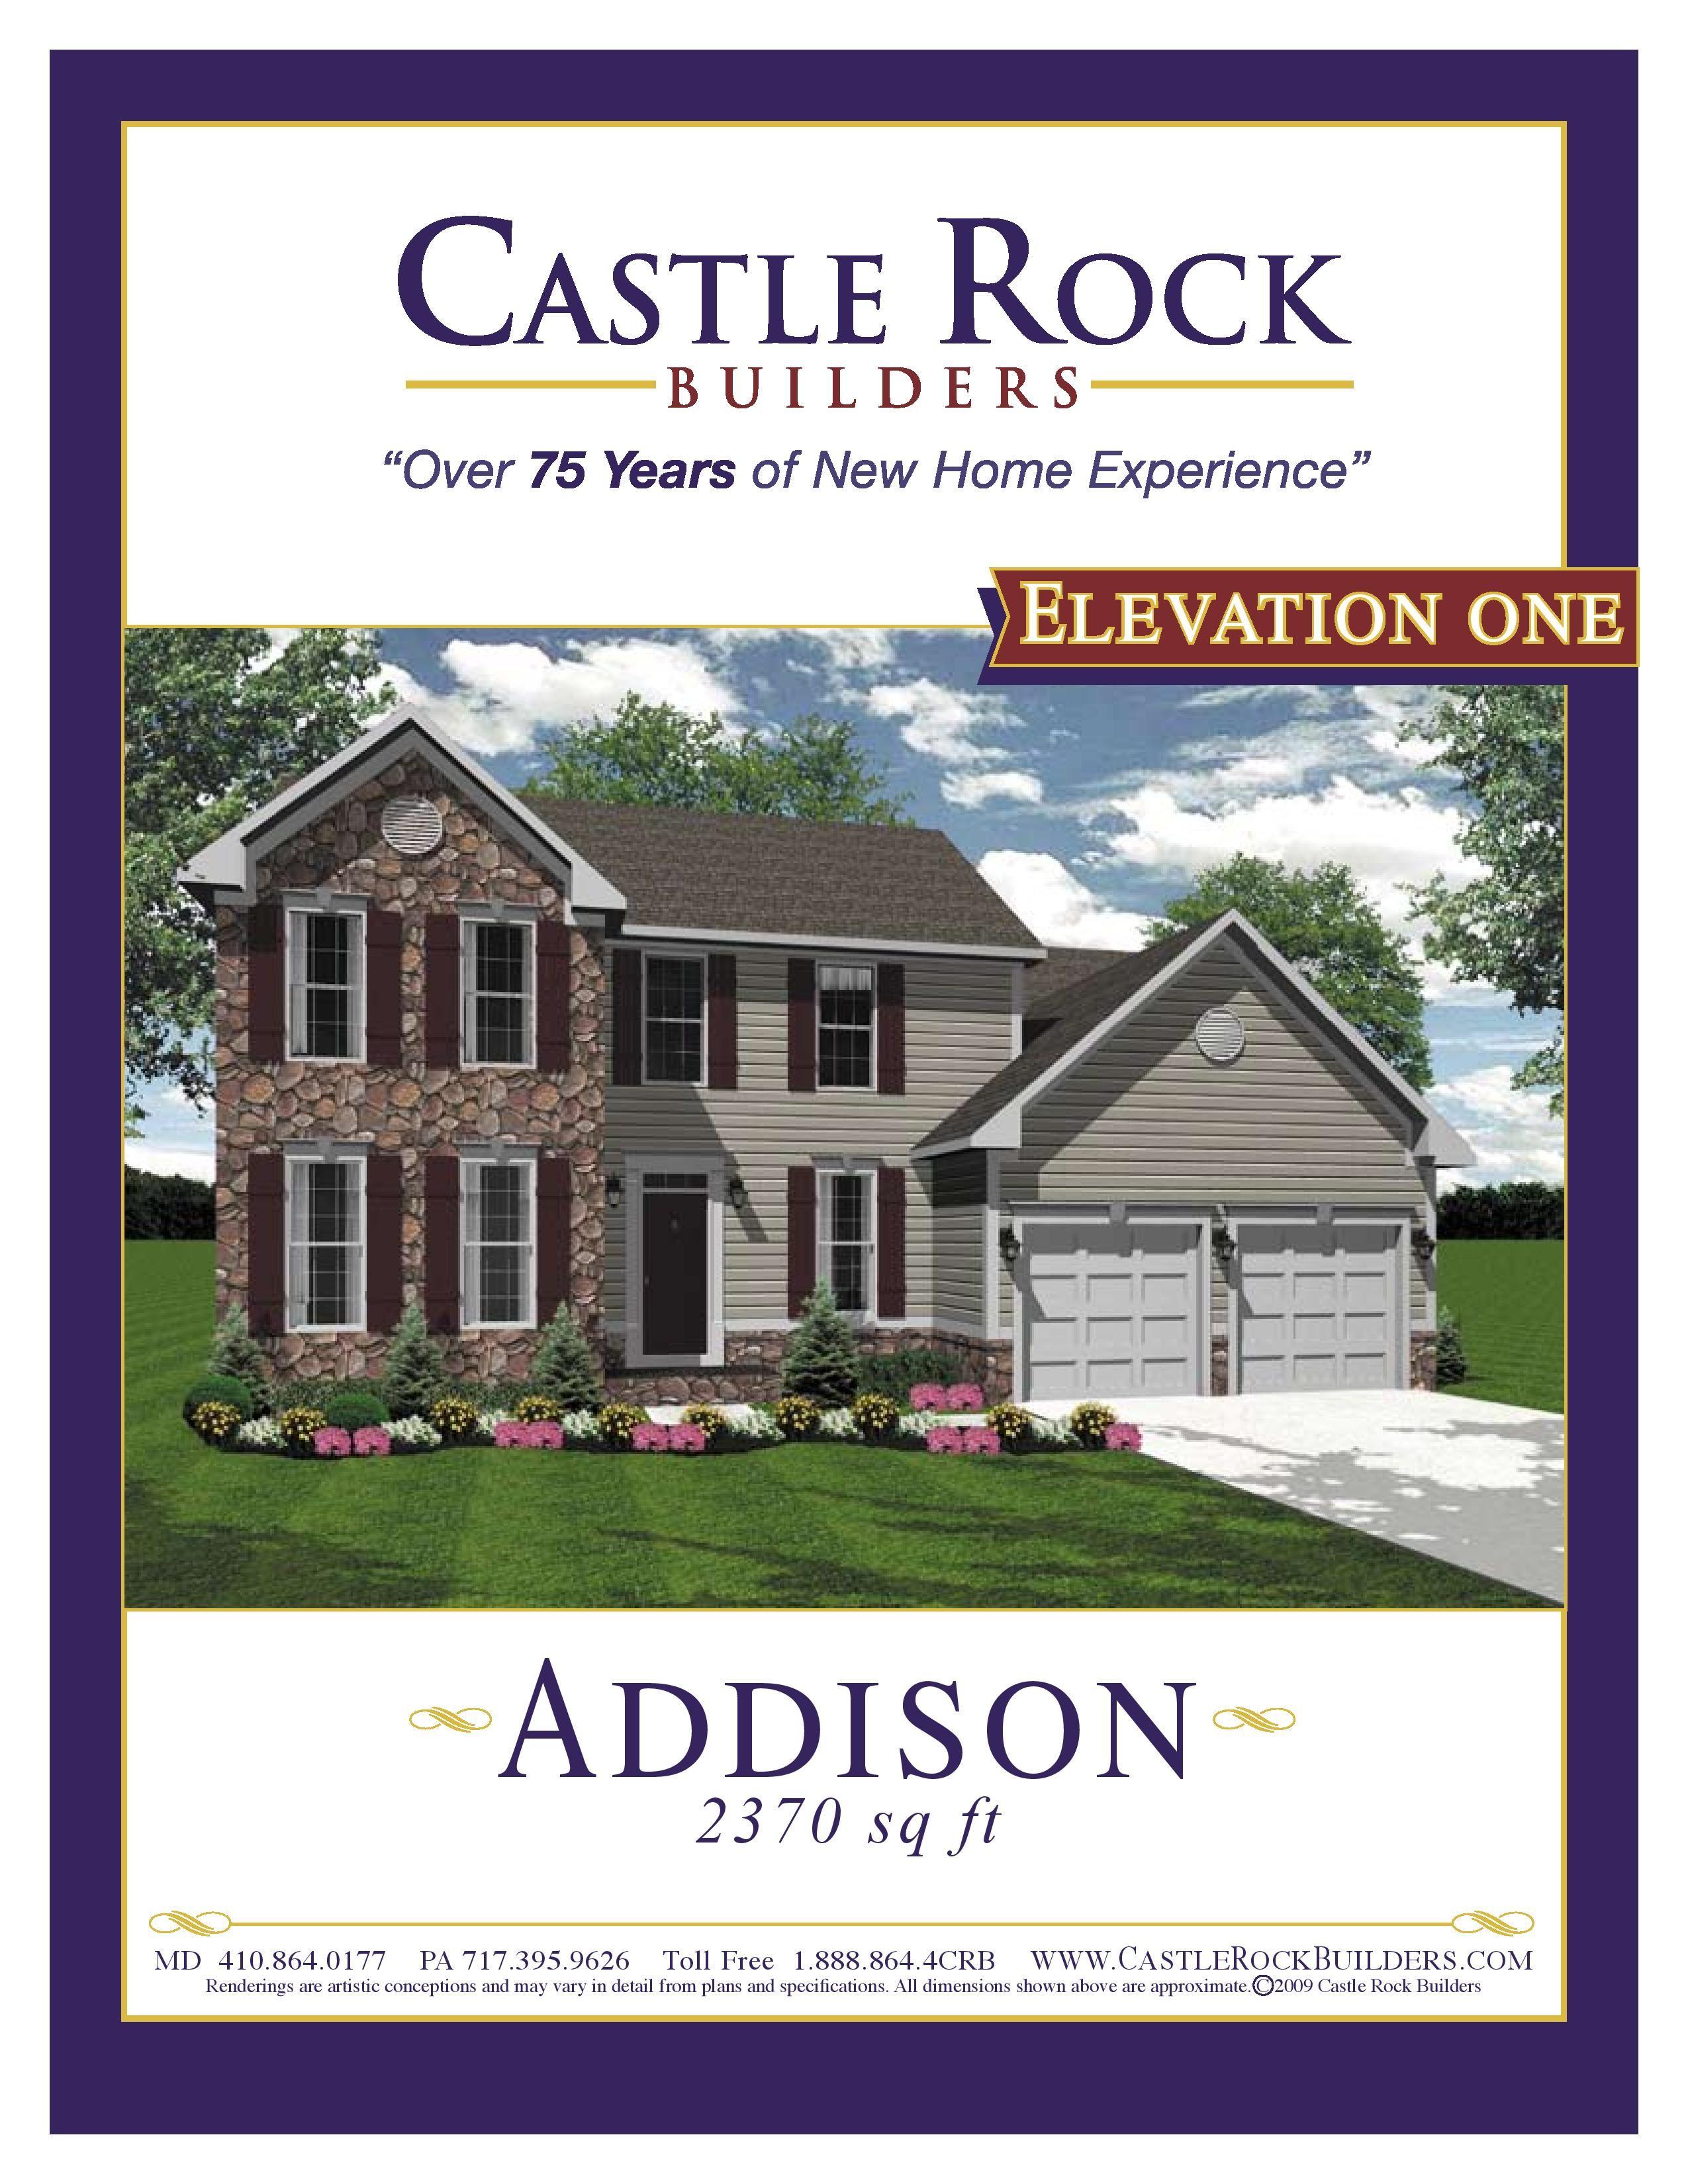 Pin it like image for Castle rock builders